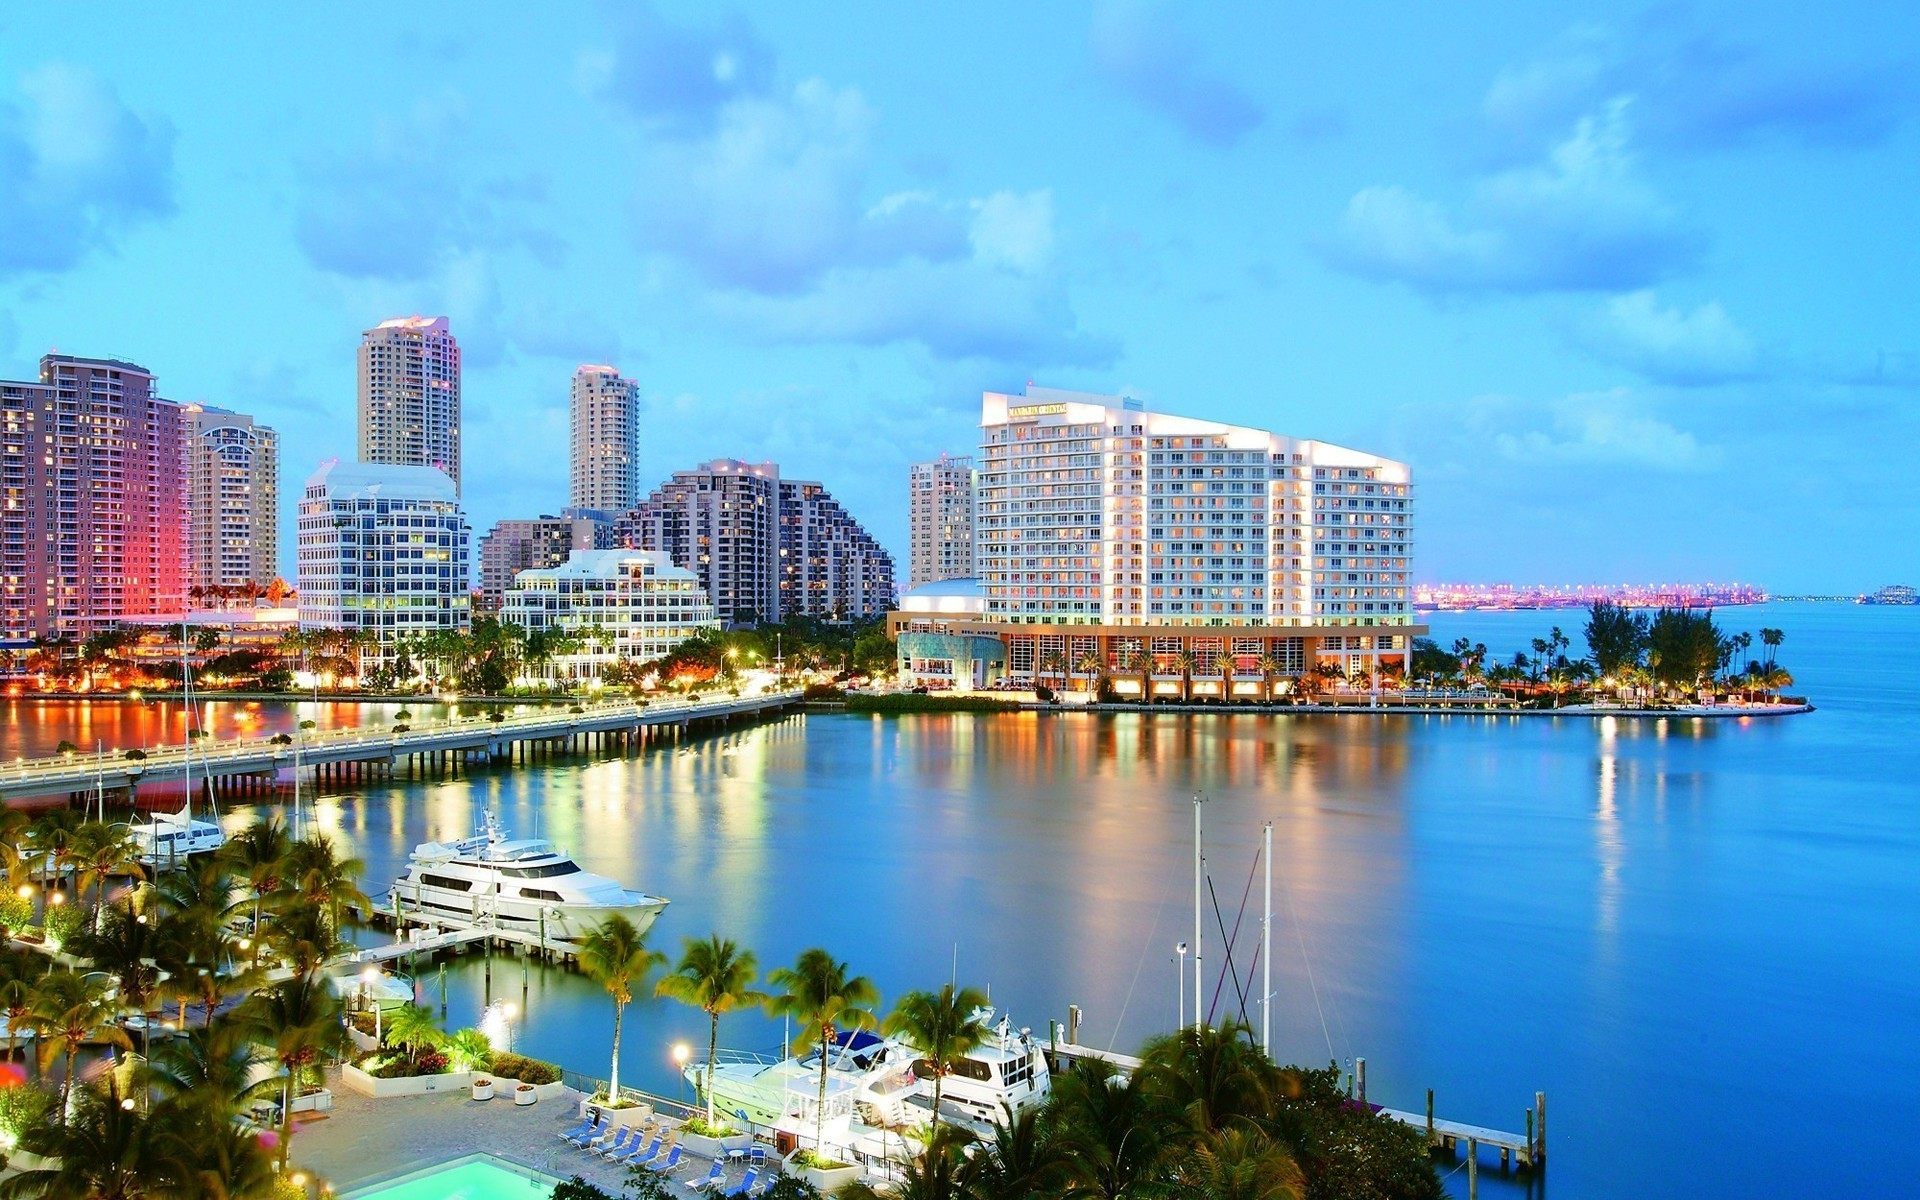 Miami Beach Wallpapers and Screensavers